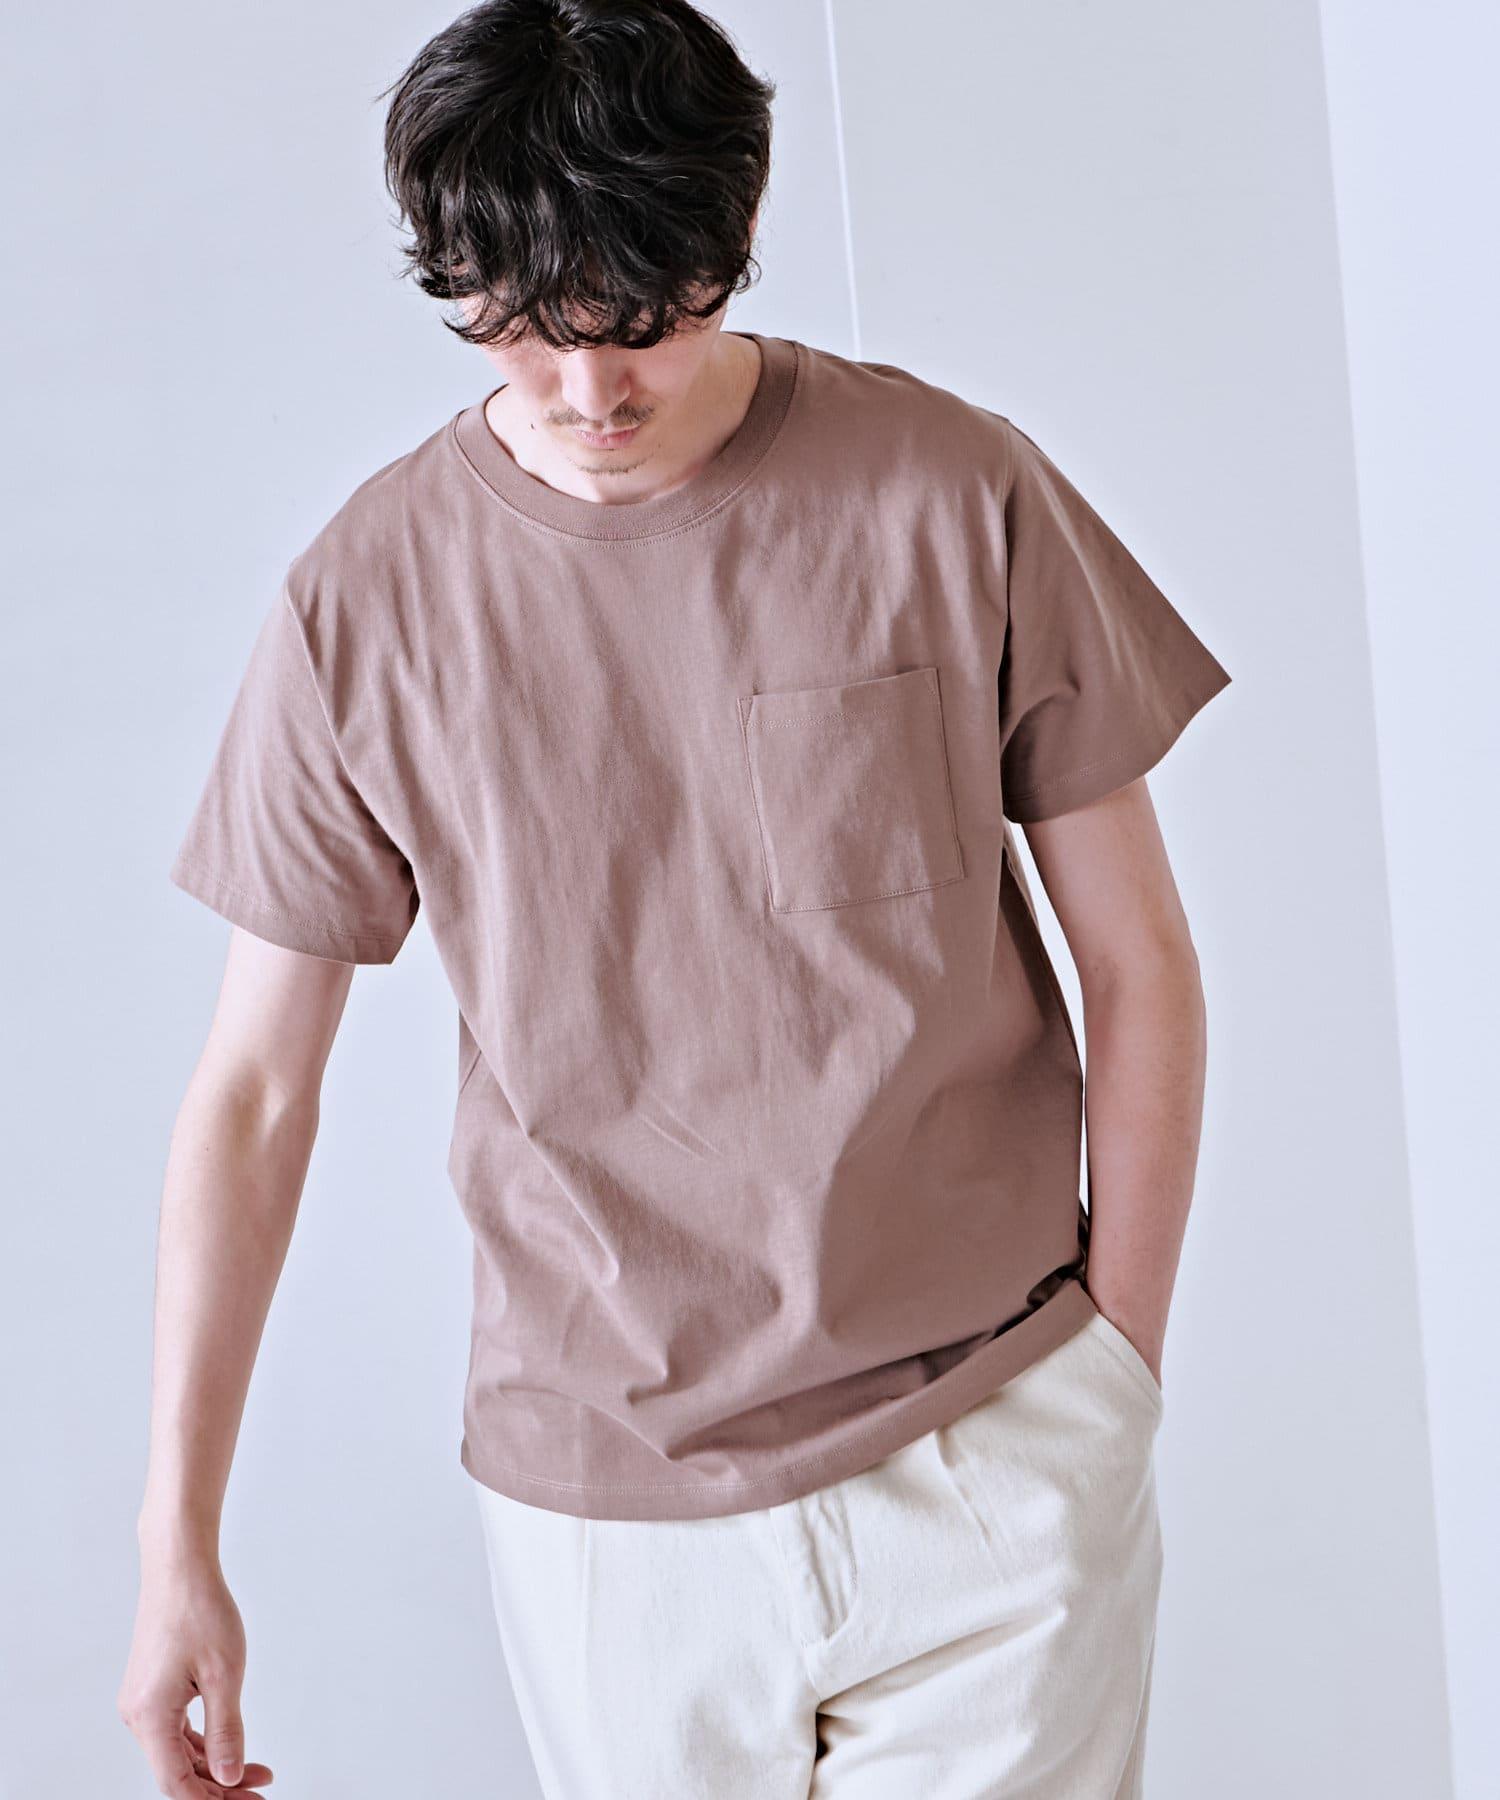 Discoat(ディスコート) メンズ USコットン胸ポケTシャツ モカ